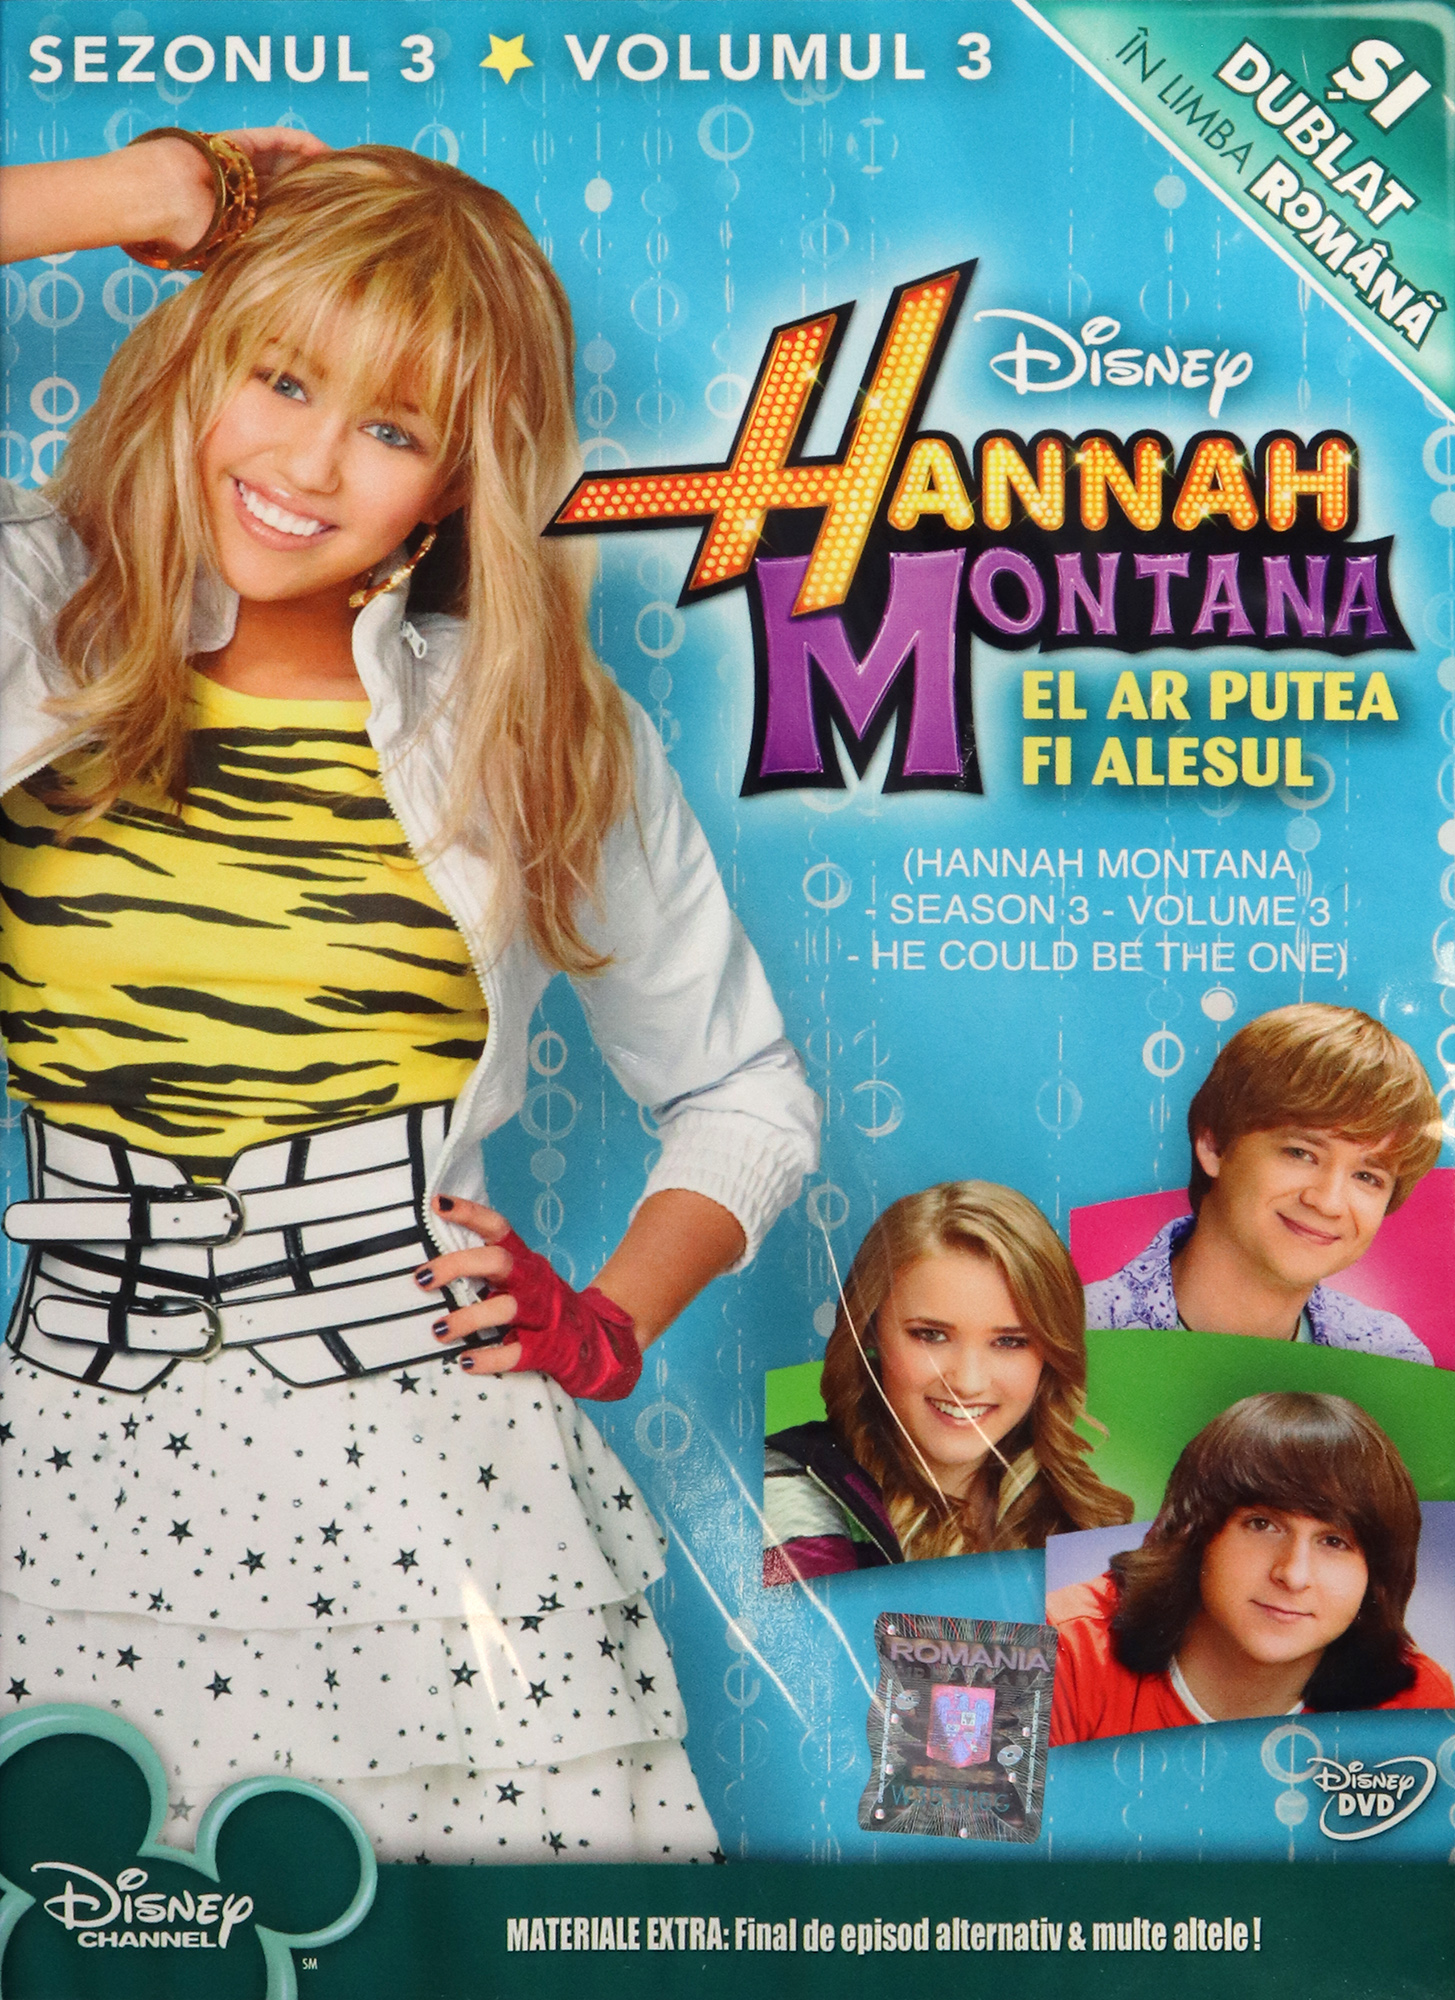 Hannah Montana - Sezonul 3, Volumul 3: El ar putea fi alesul / He Could Be the One